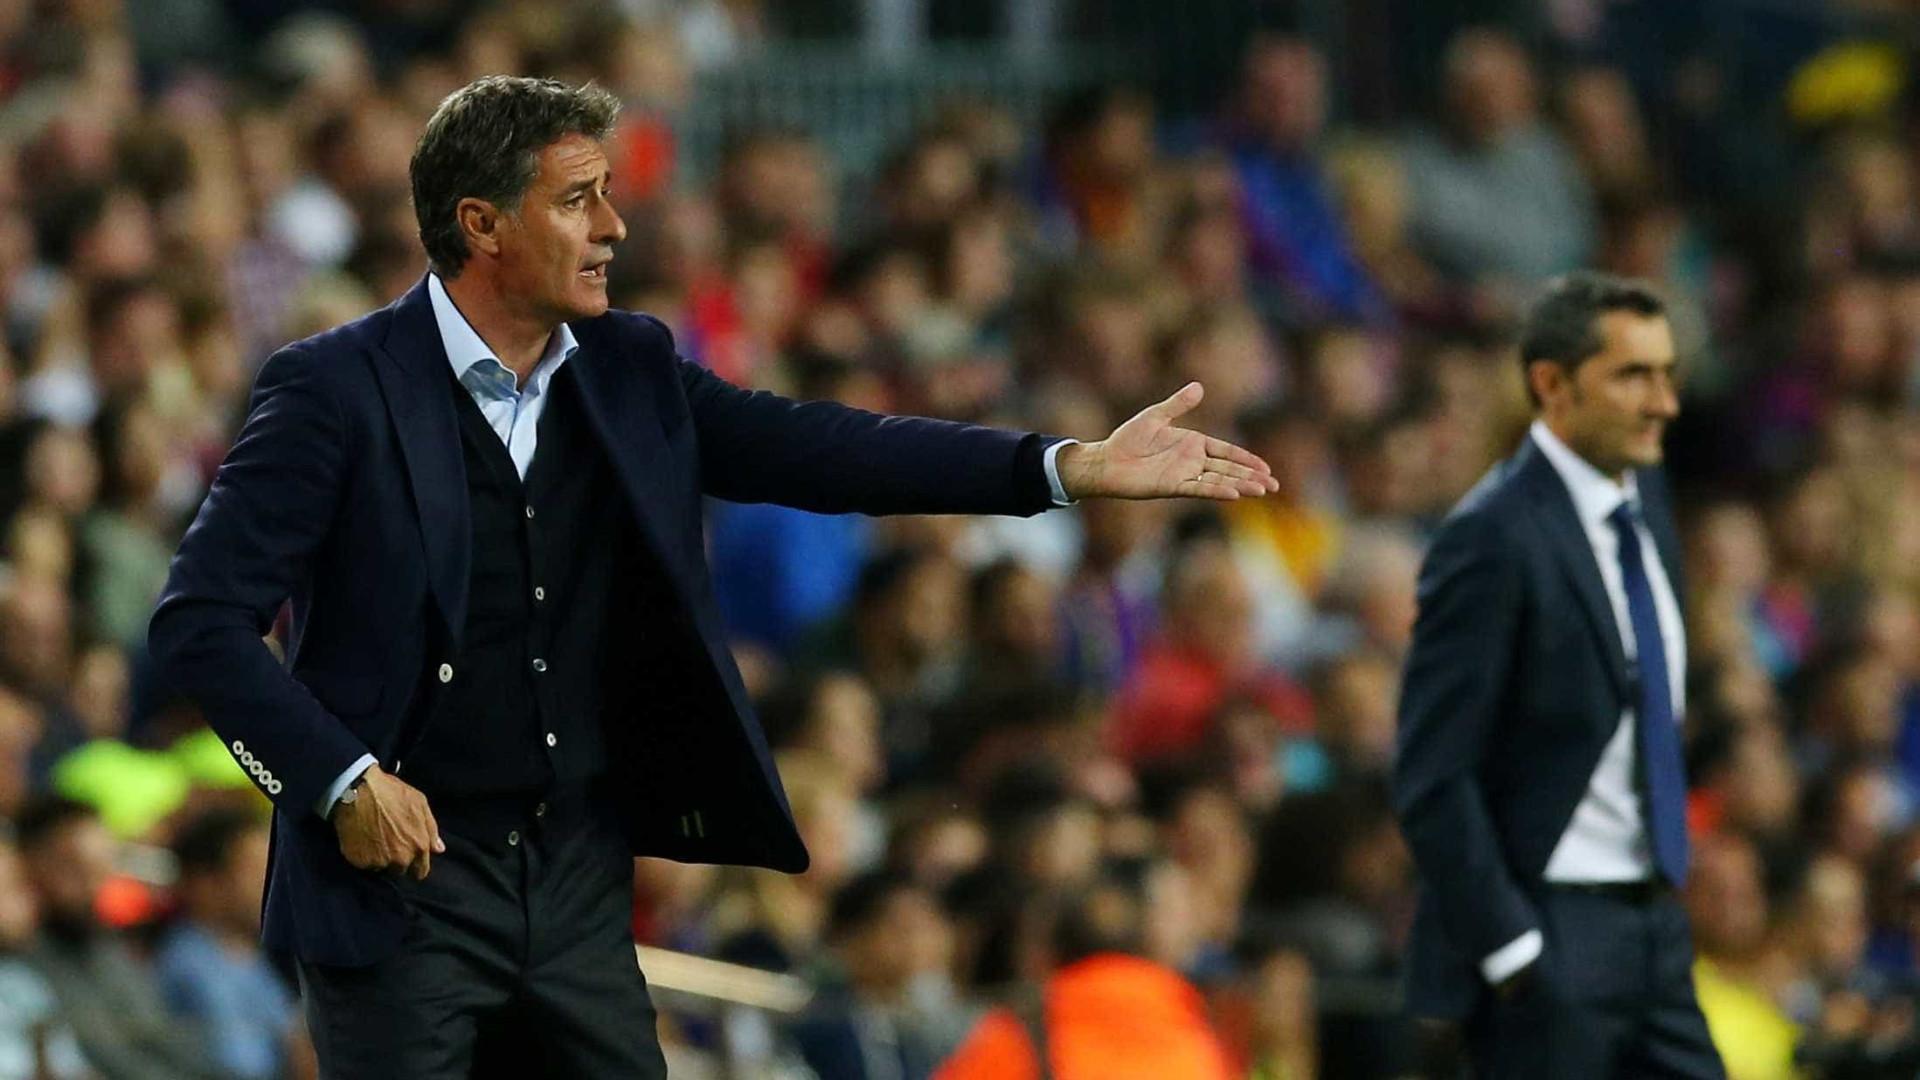 Maus resultados levam Málaga a despedir treinador